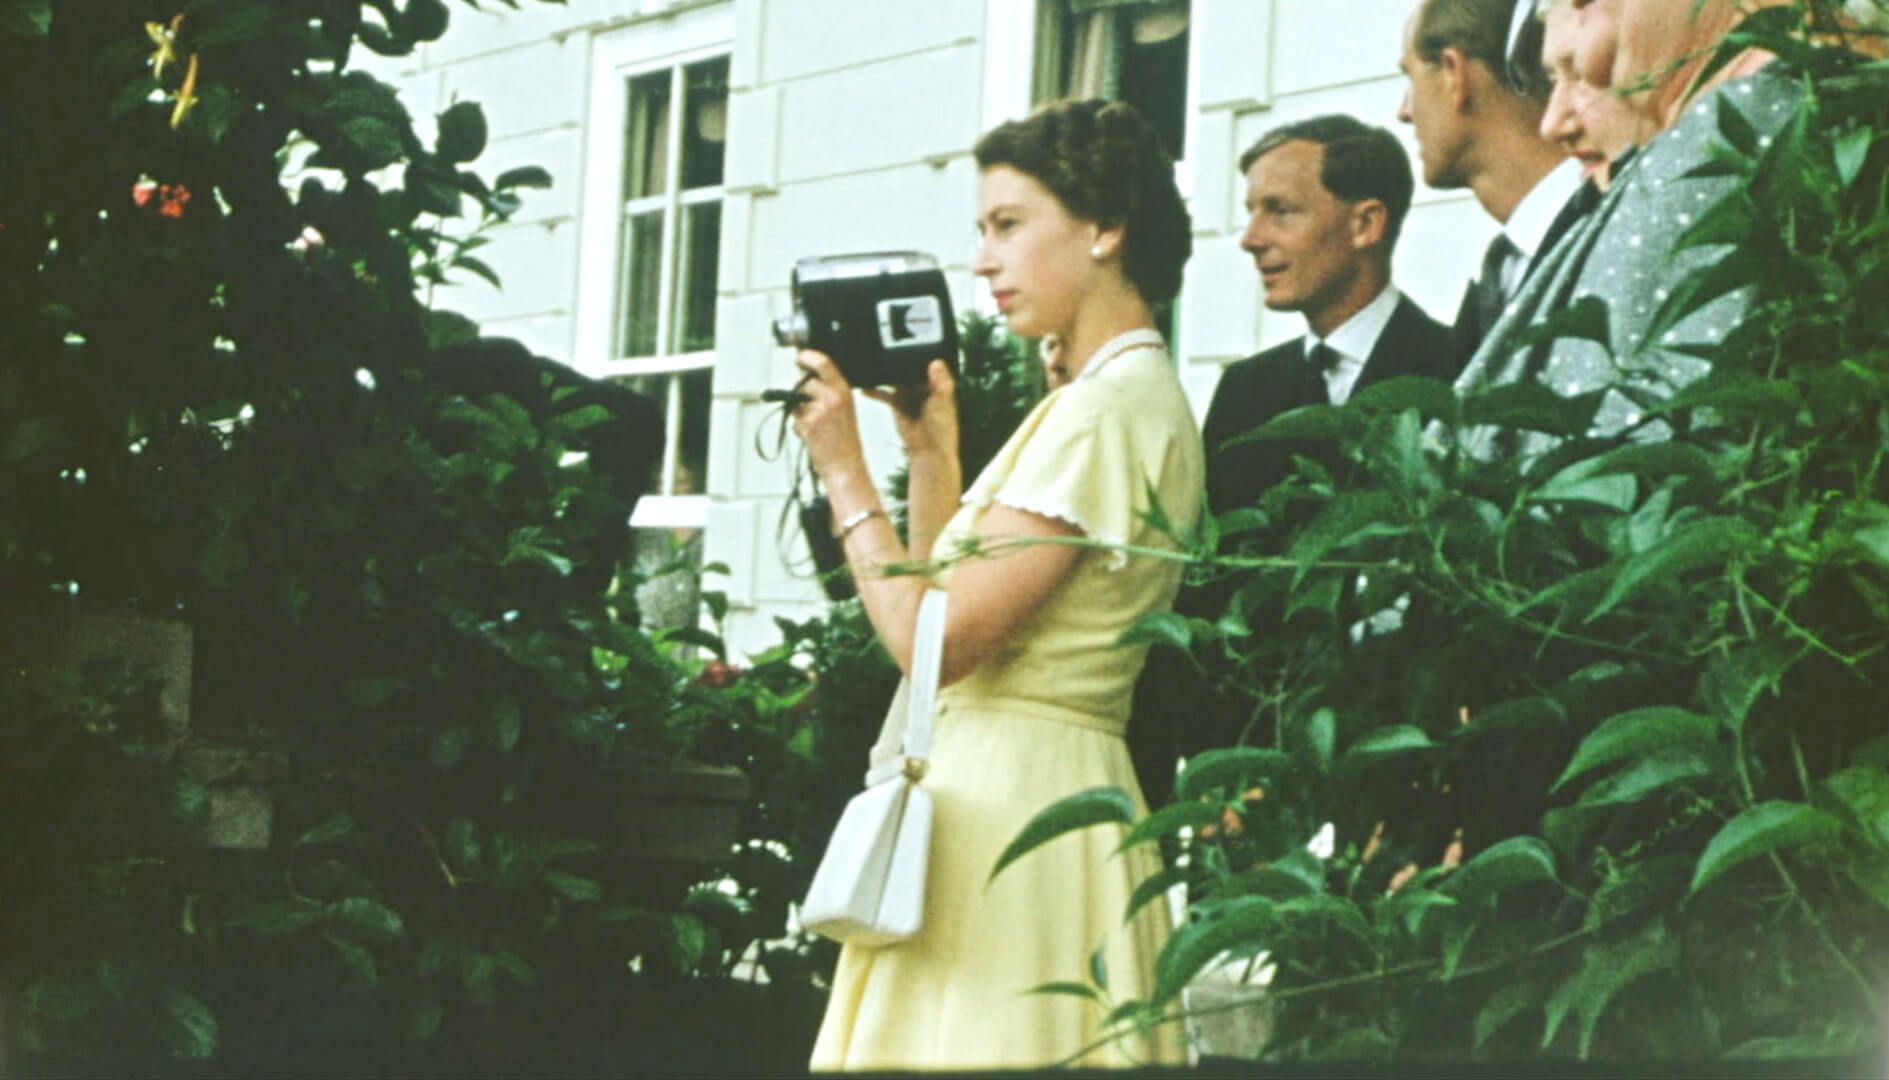 young queen elizabeth II with home camera